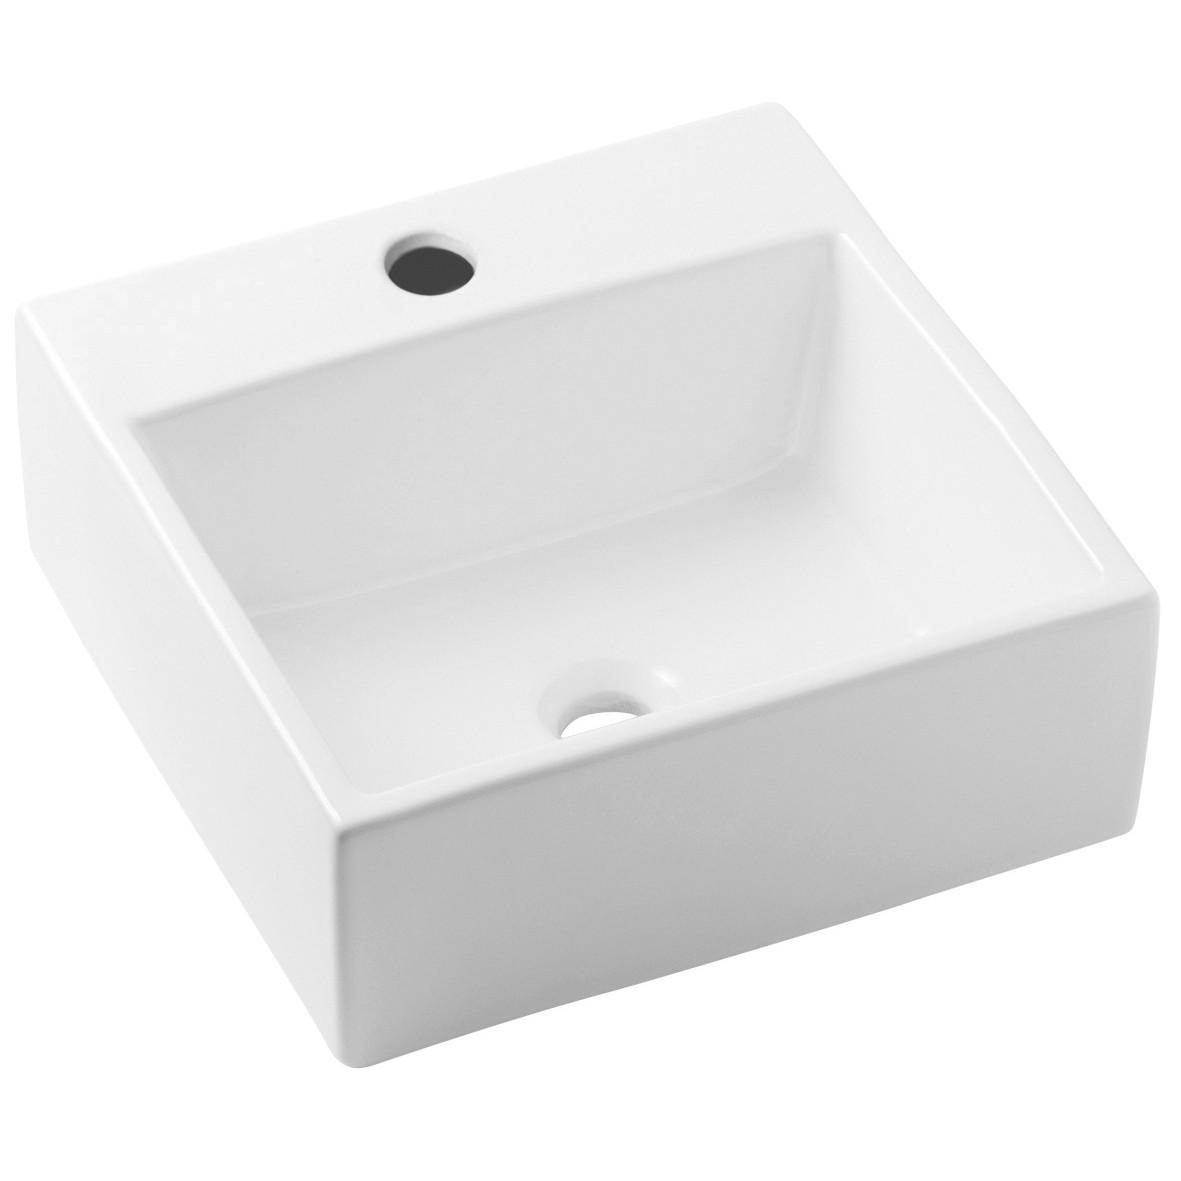 Cuba de Louca de Apoio com Mesa Quadrado 35x35 cm Branco Basic Matte - Celite